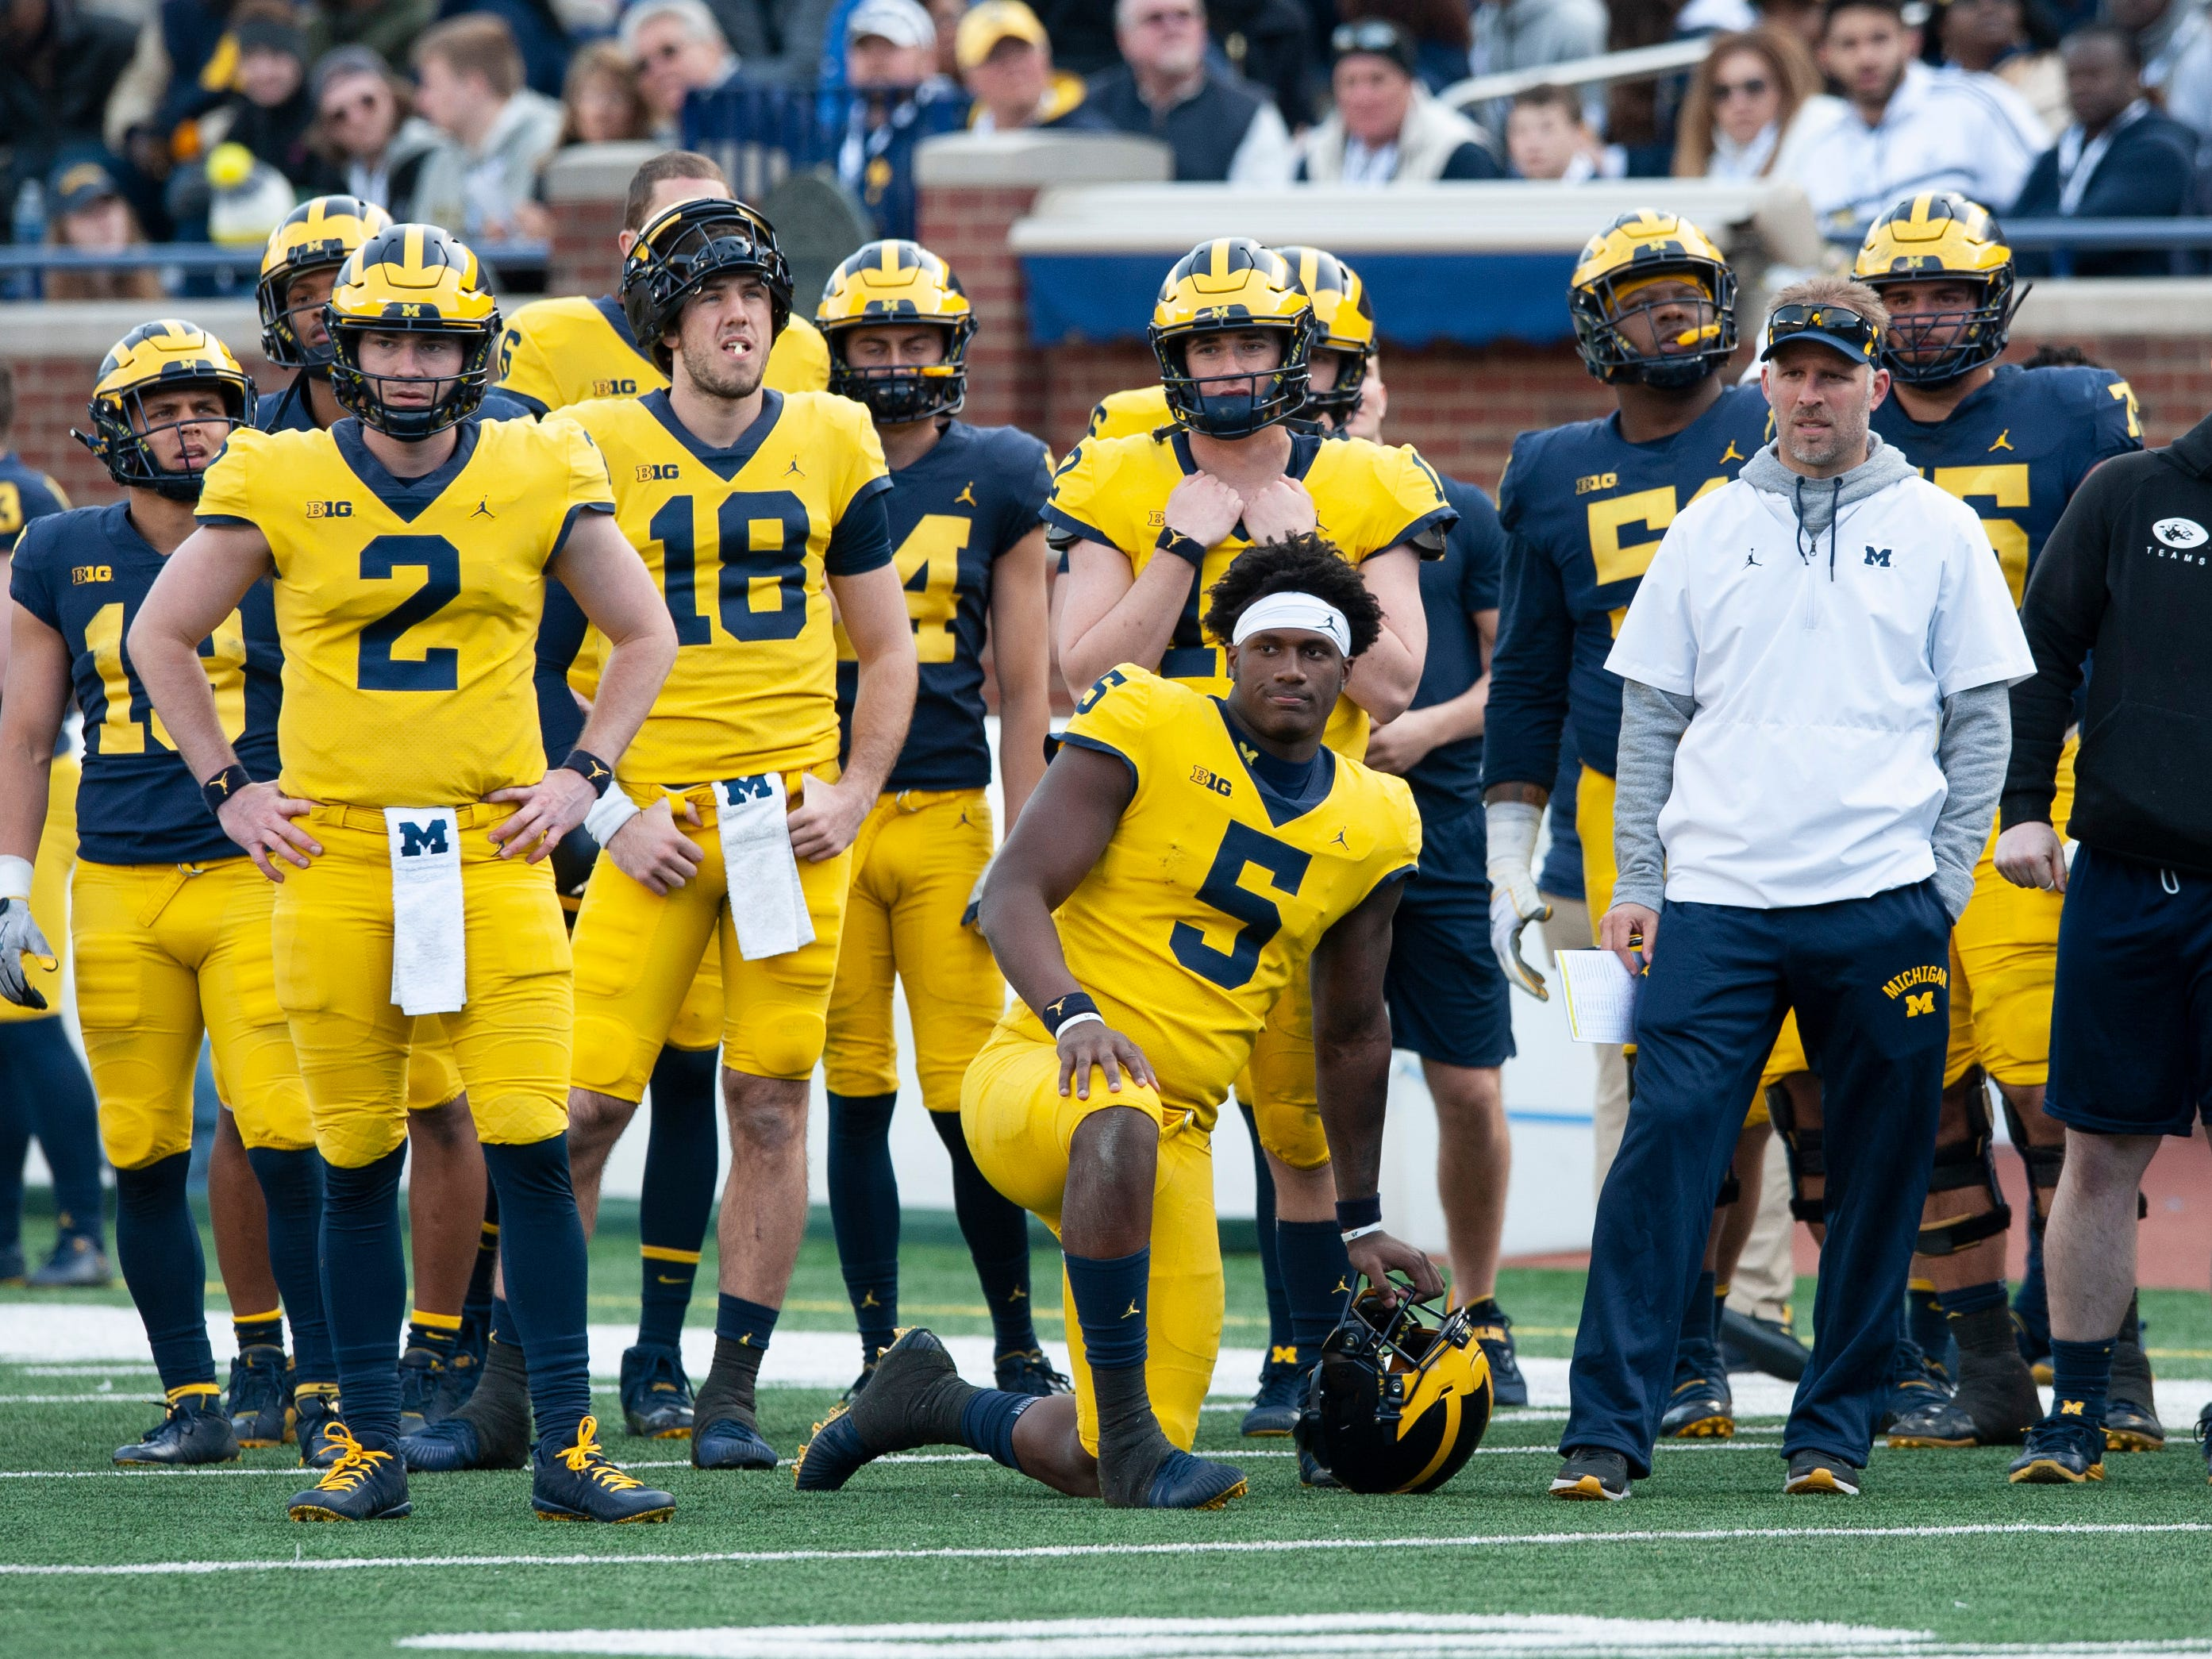 Michigan's new quarterbacks coach Ben McDaniels (right) and quarterbacks Shea Patterson (2), Brandon Peters (18), Joe Milton (5) and freshman Cade McNamara (behind Milton) watch the scrimmage from the offensive players' sideline.